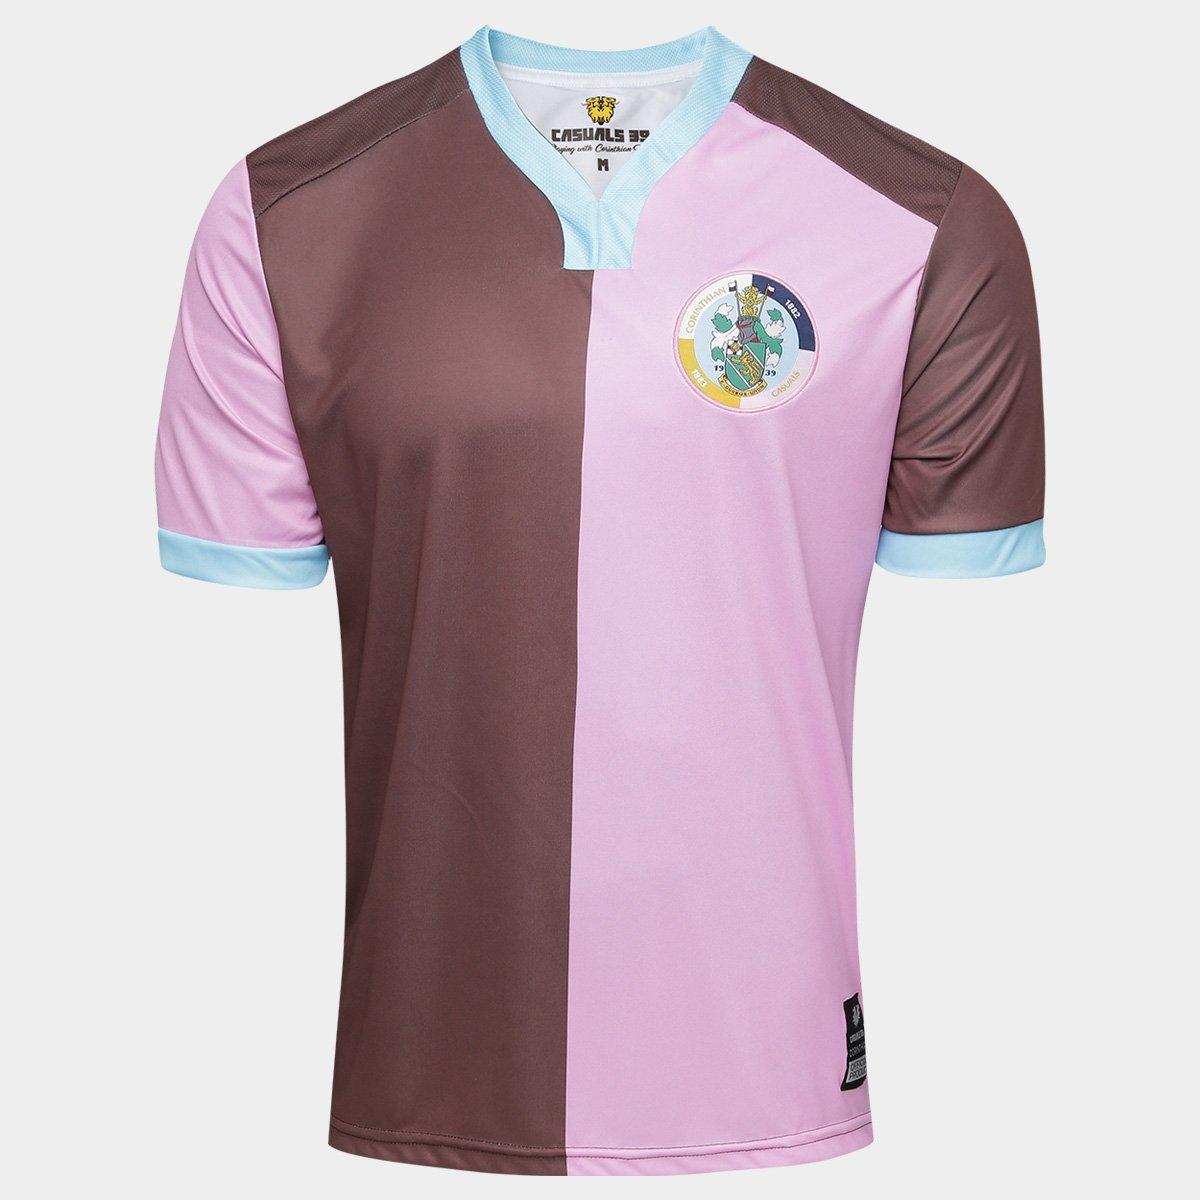 2a2eef2f99 Camisa Corinthian Casuals Home 17 18 Torcedor - Masculina - Marrom e ...